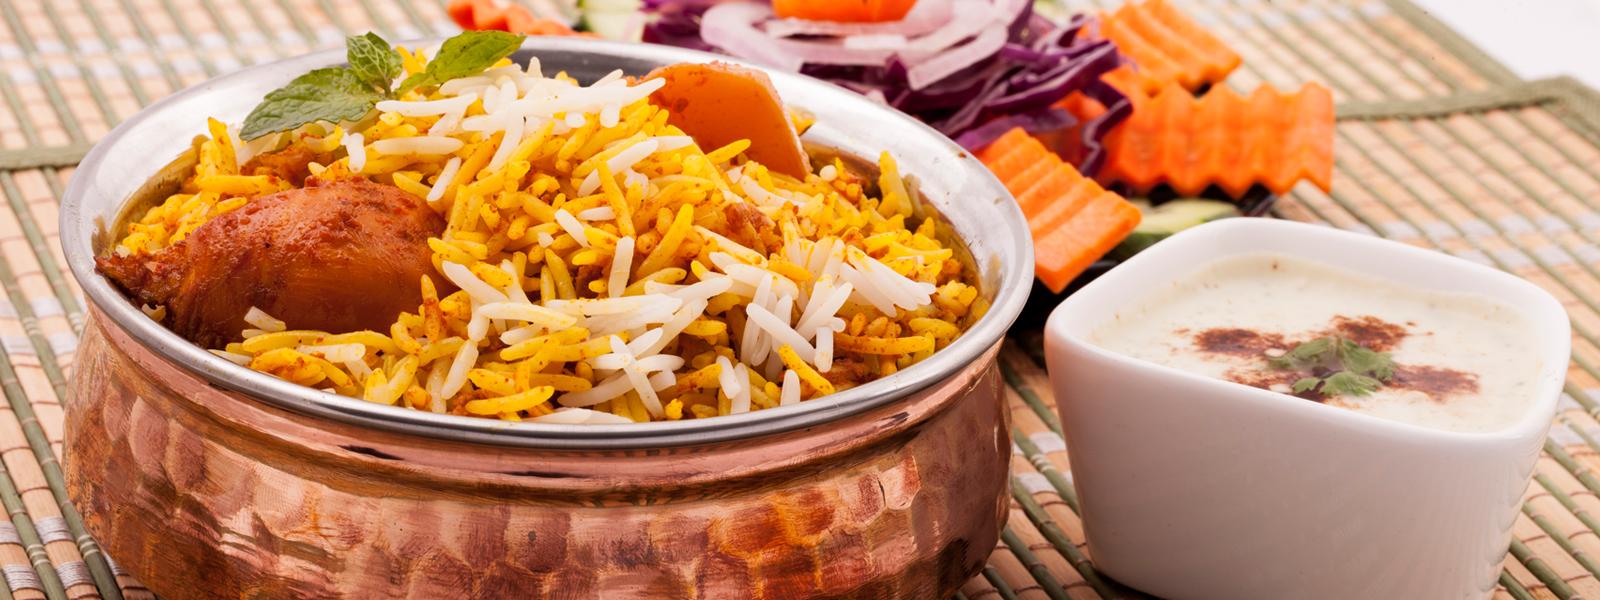 Falak Rice - Best Basmati Rice In Pakistan - Welcome